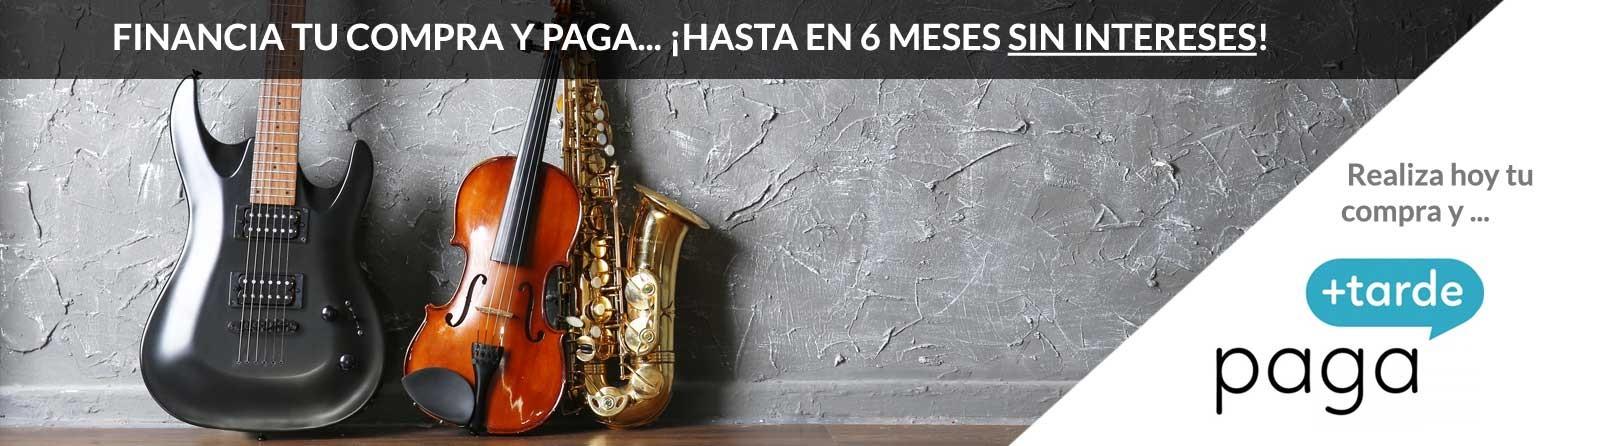 Paga + Tarde